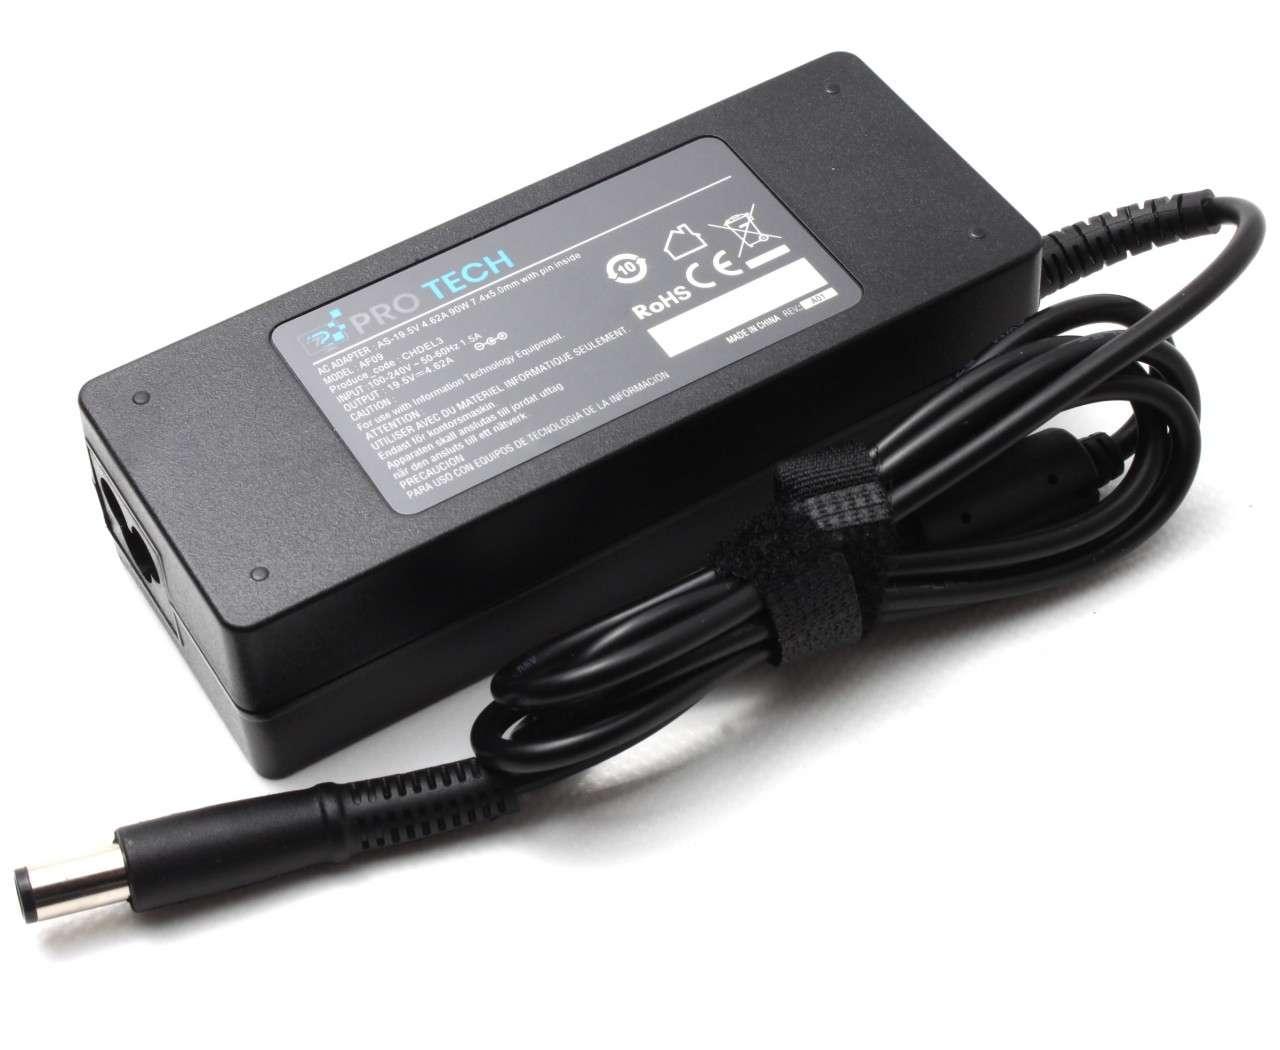 Incarcator Dell Vostro 1521 Replacement imagine powerlaptop.ro 2021